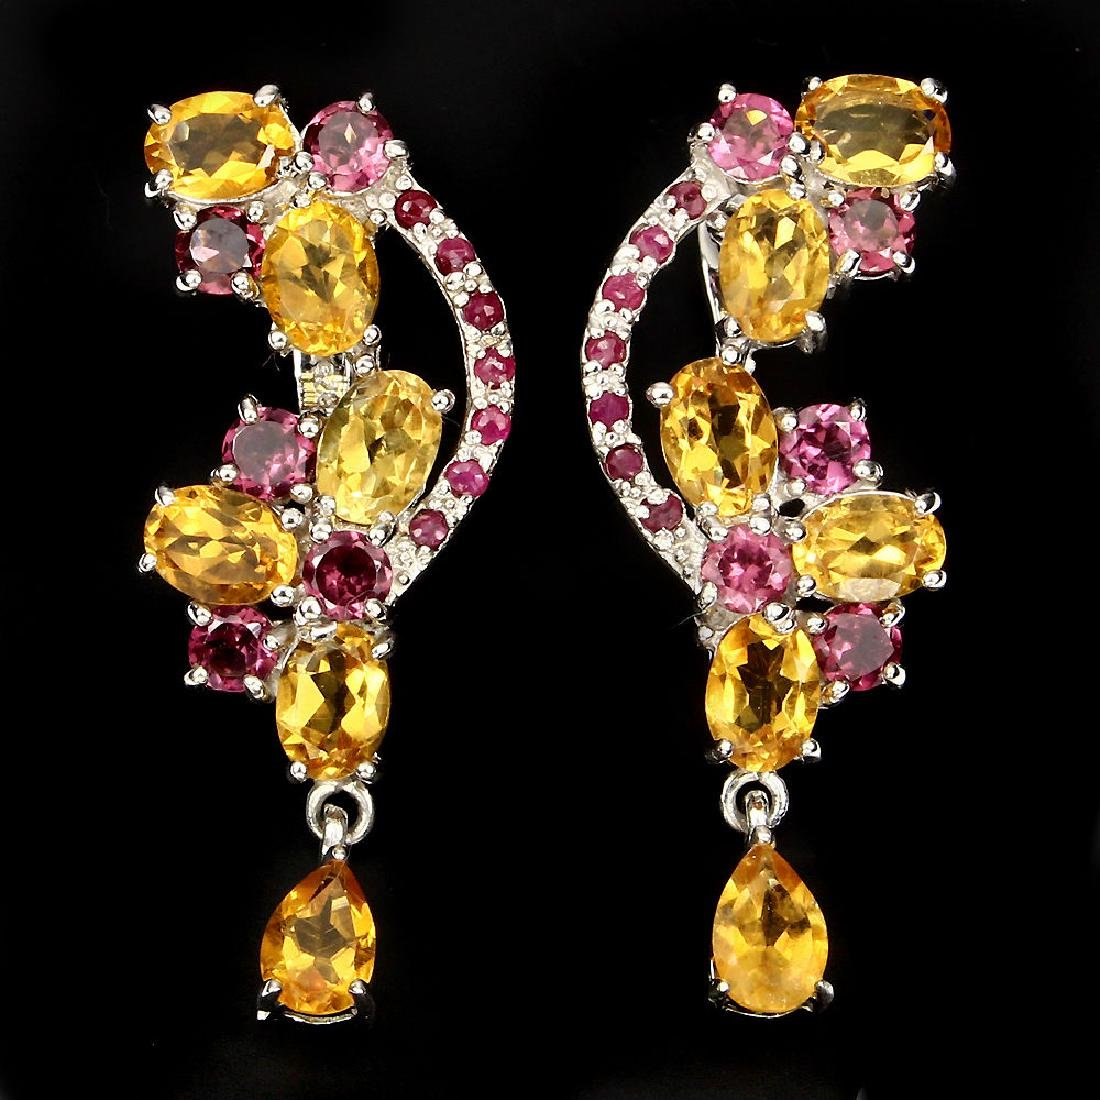 Natural Yellow Citrine Rhodolite Garnet Ruby Earrings